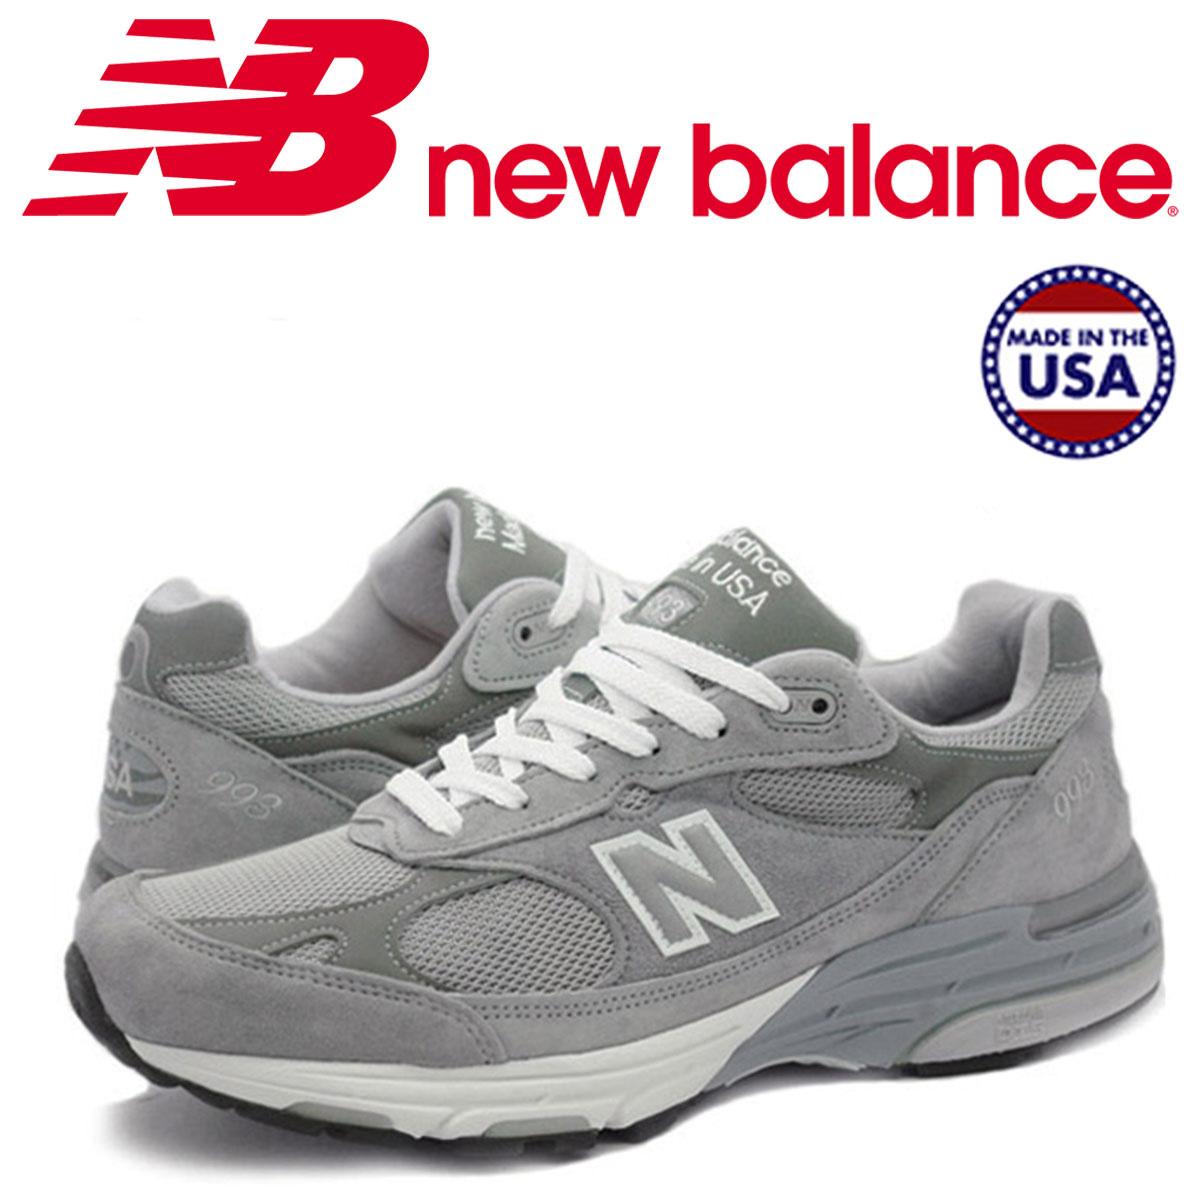 viele möglichkeiten klassischer Stil exklusives Sortiment new balance MR993GL 993 men's New Balance sneakers D Wise MADE IN USA gray  [10/25 reentry load]